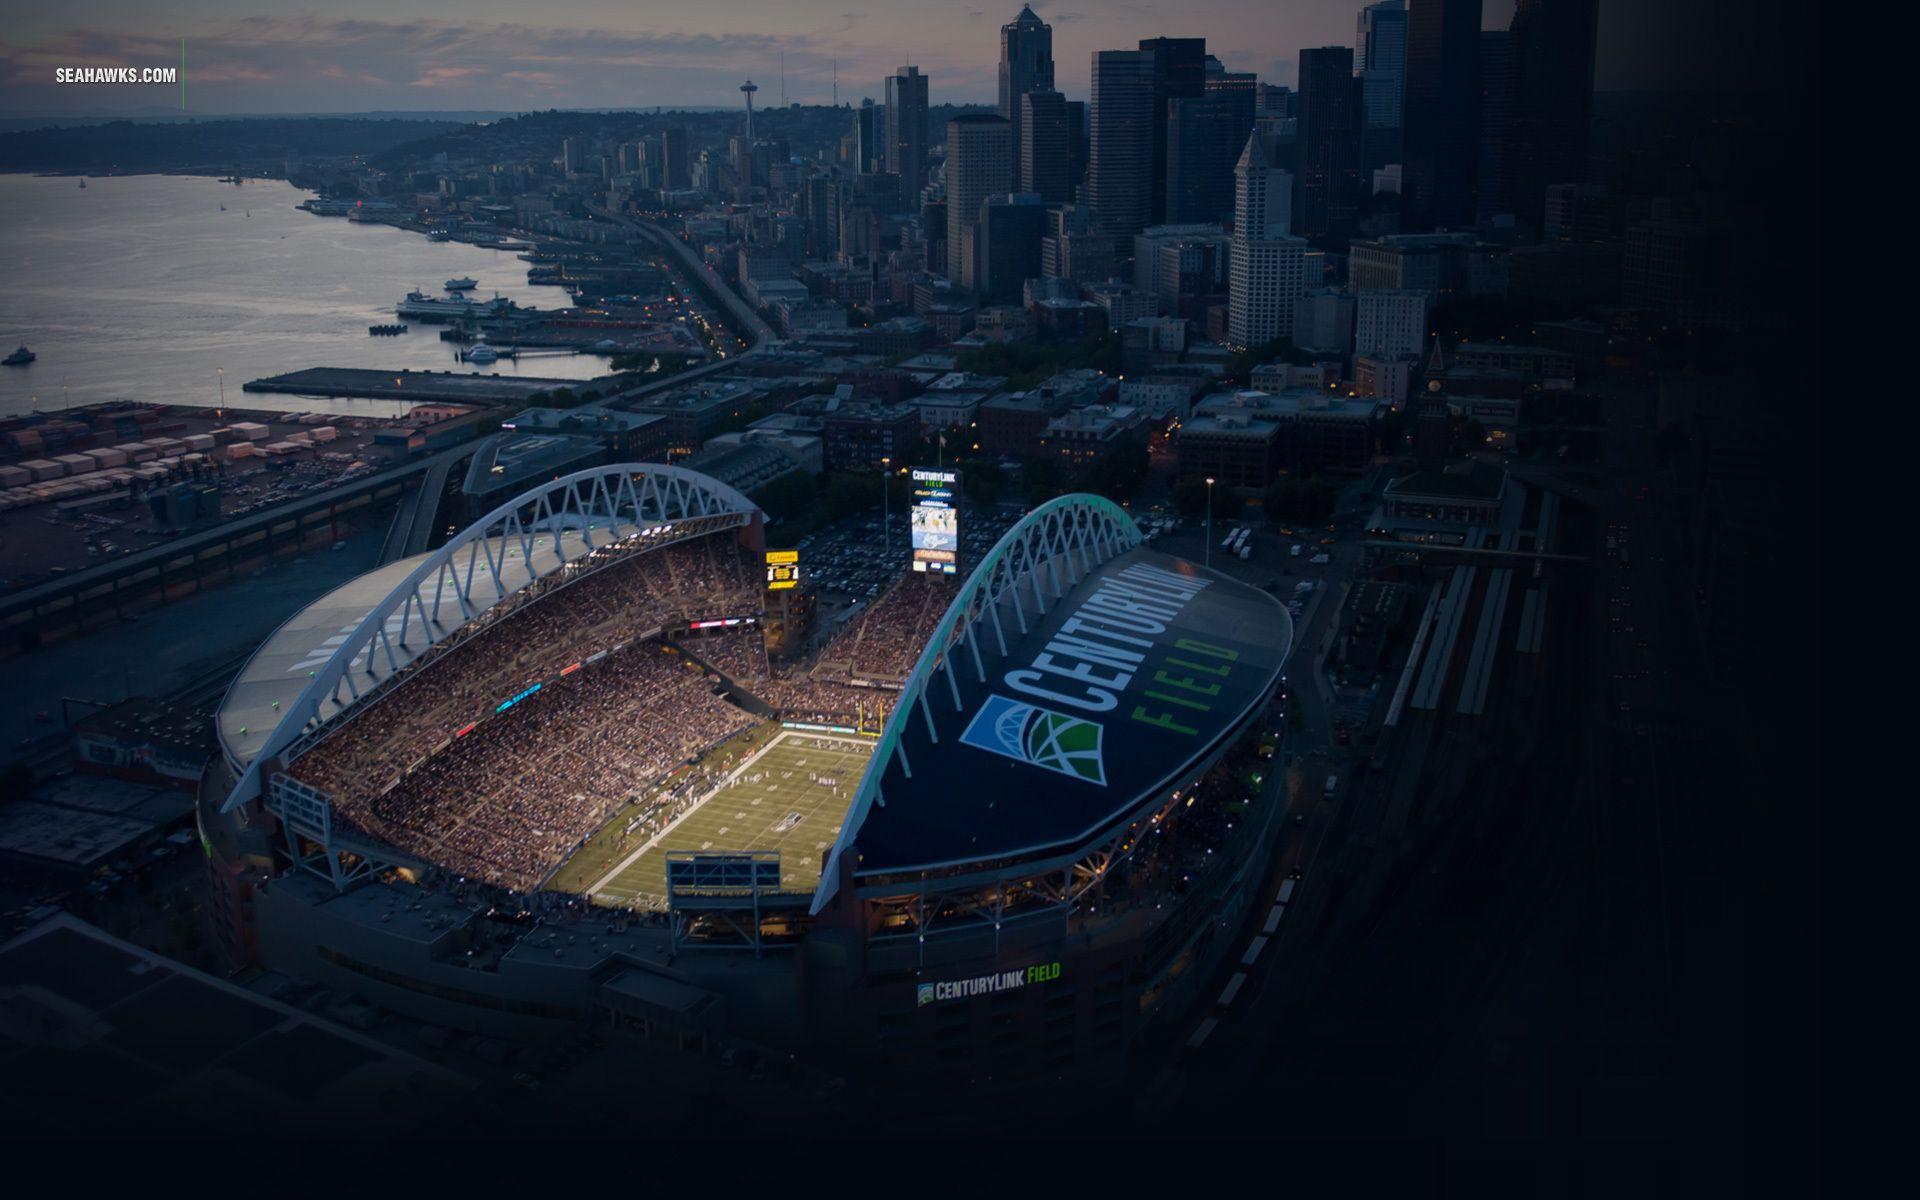 seattle seahawks stadium hd wallpaper 55975